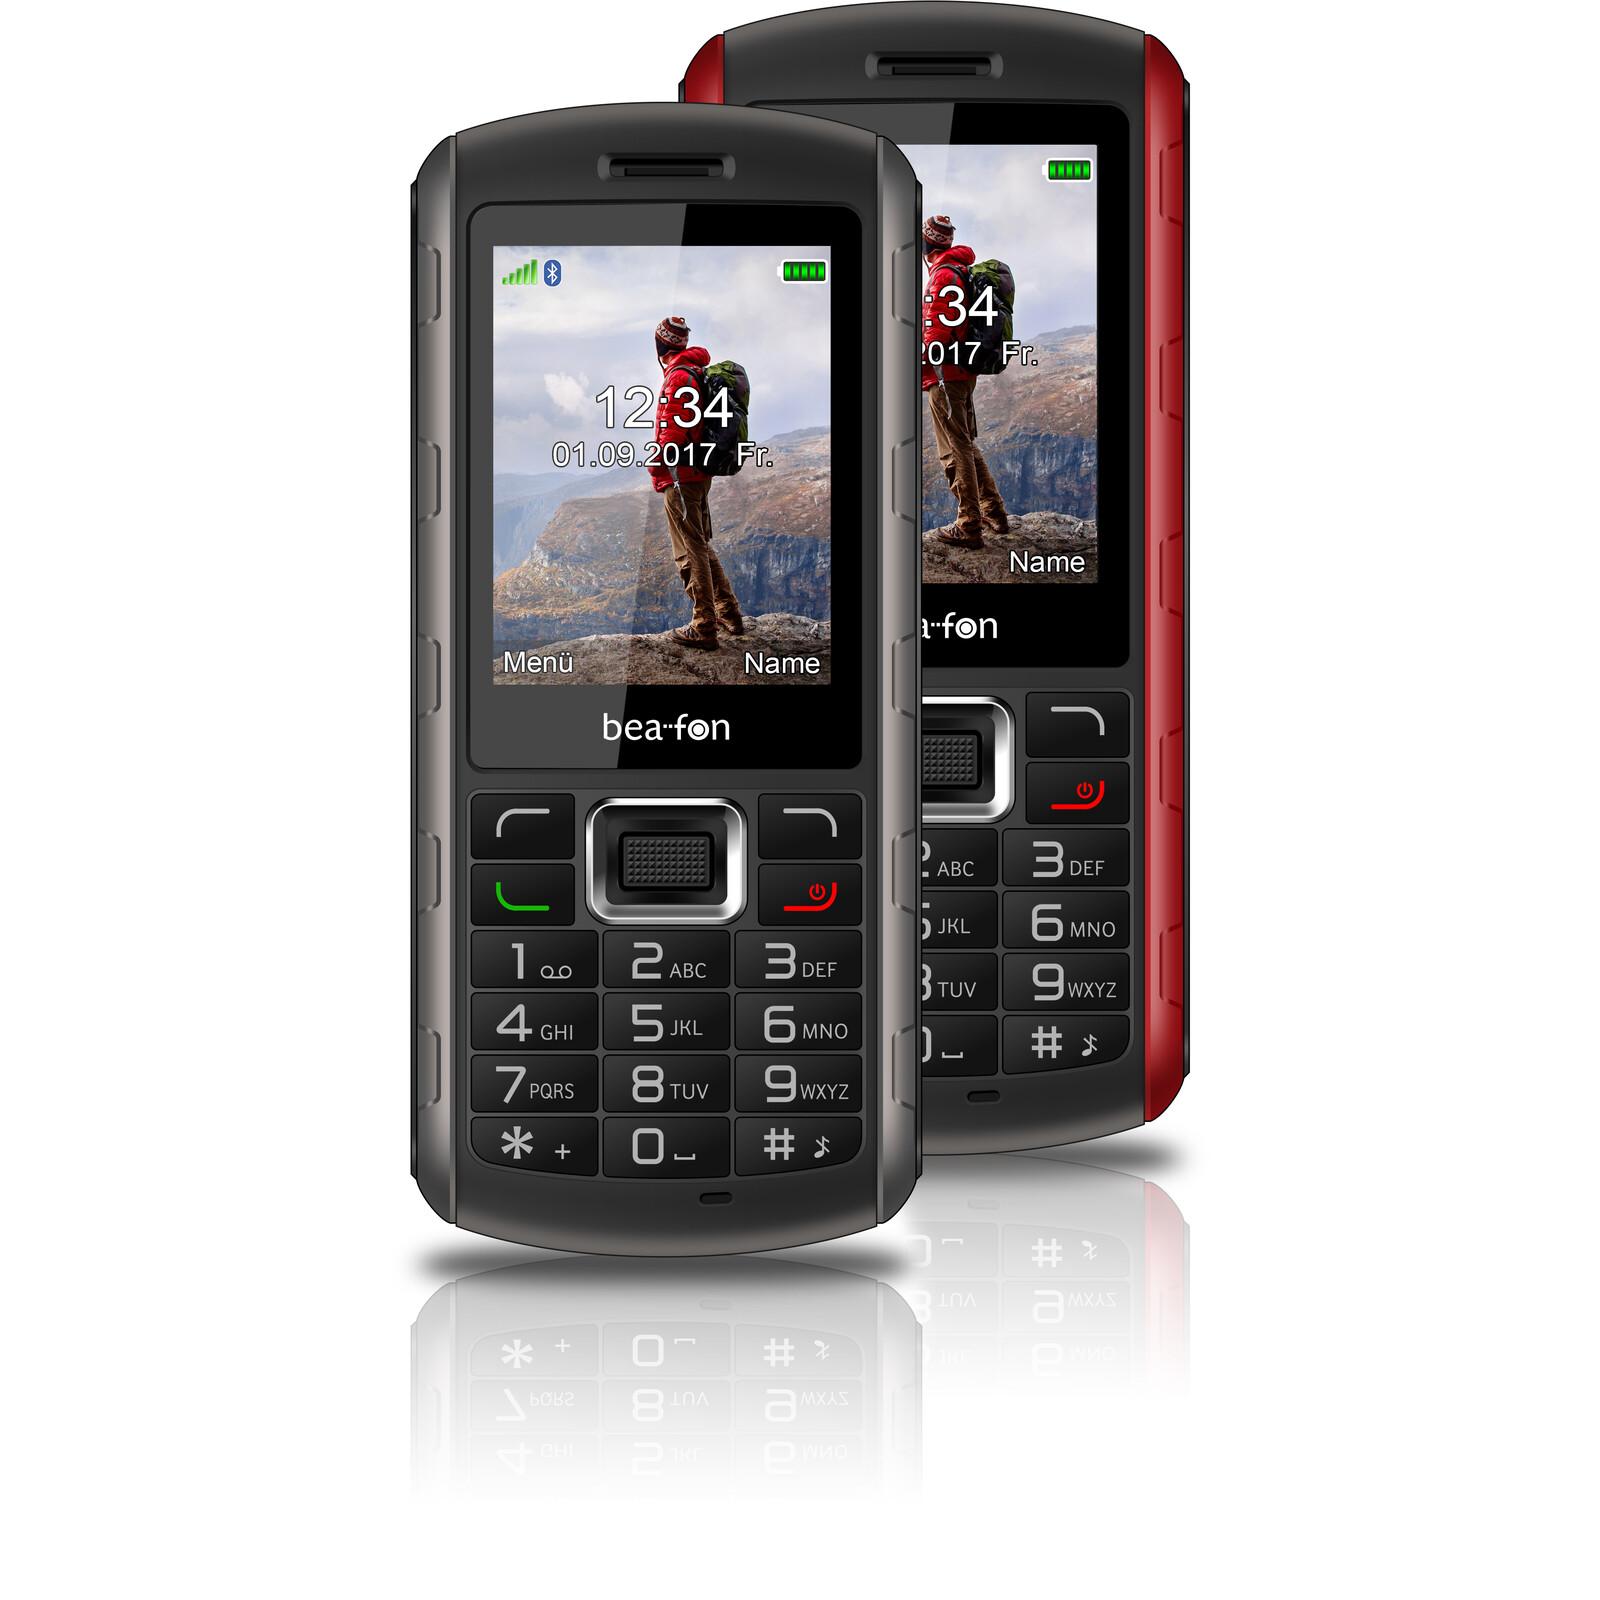 Beafon AL560 black red Outdoor